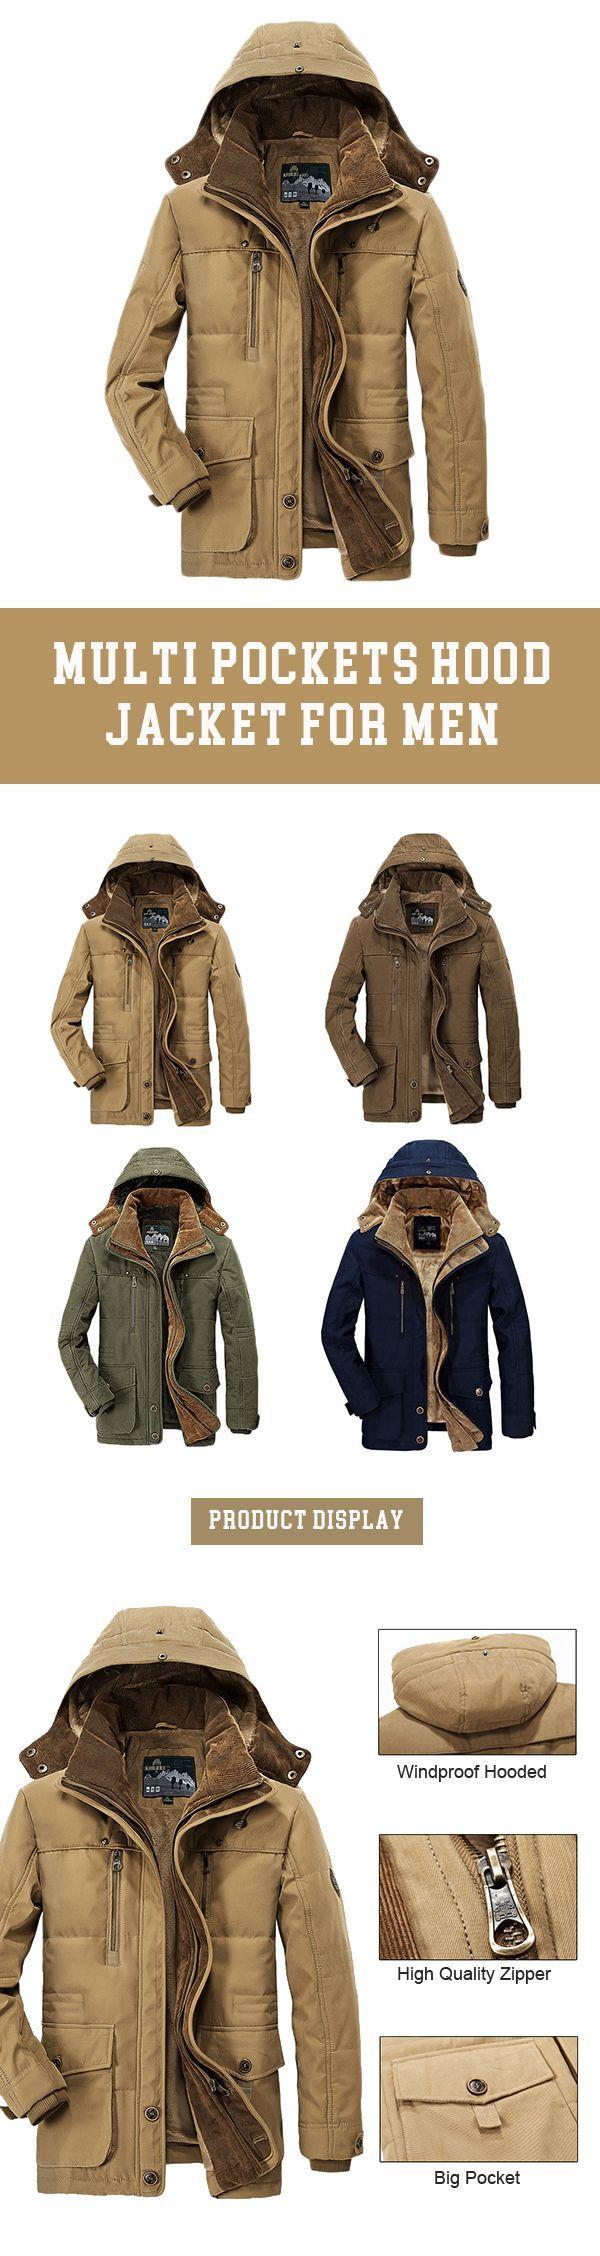 US$75.68 Winter Thicken Warm Multi Pockets Solid Color Detachable Hood Jacket for Men